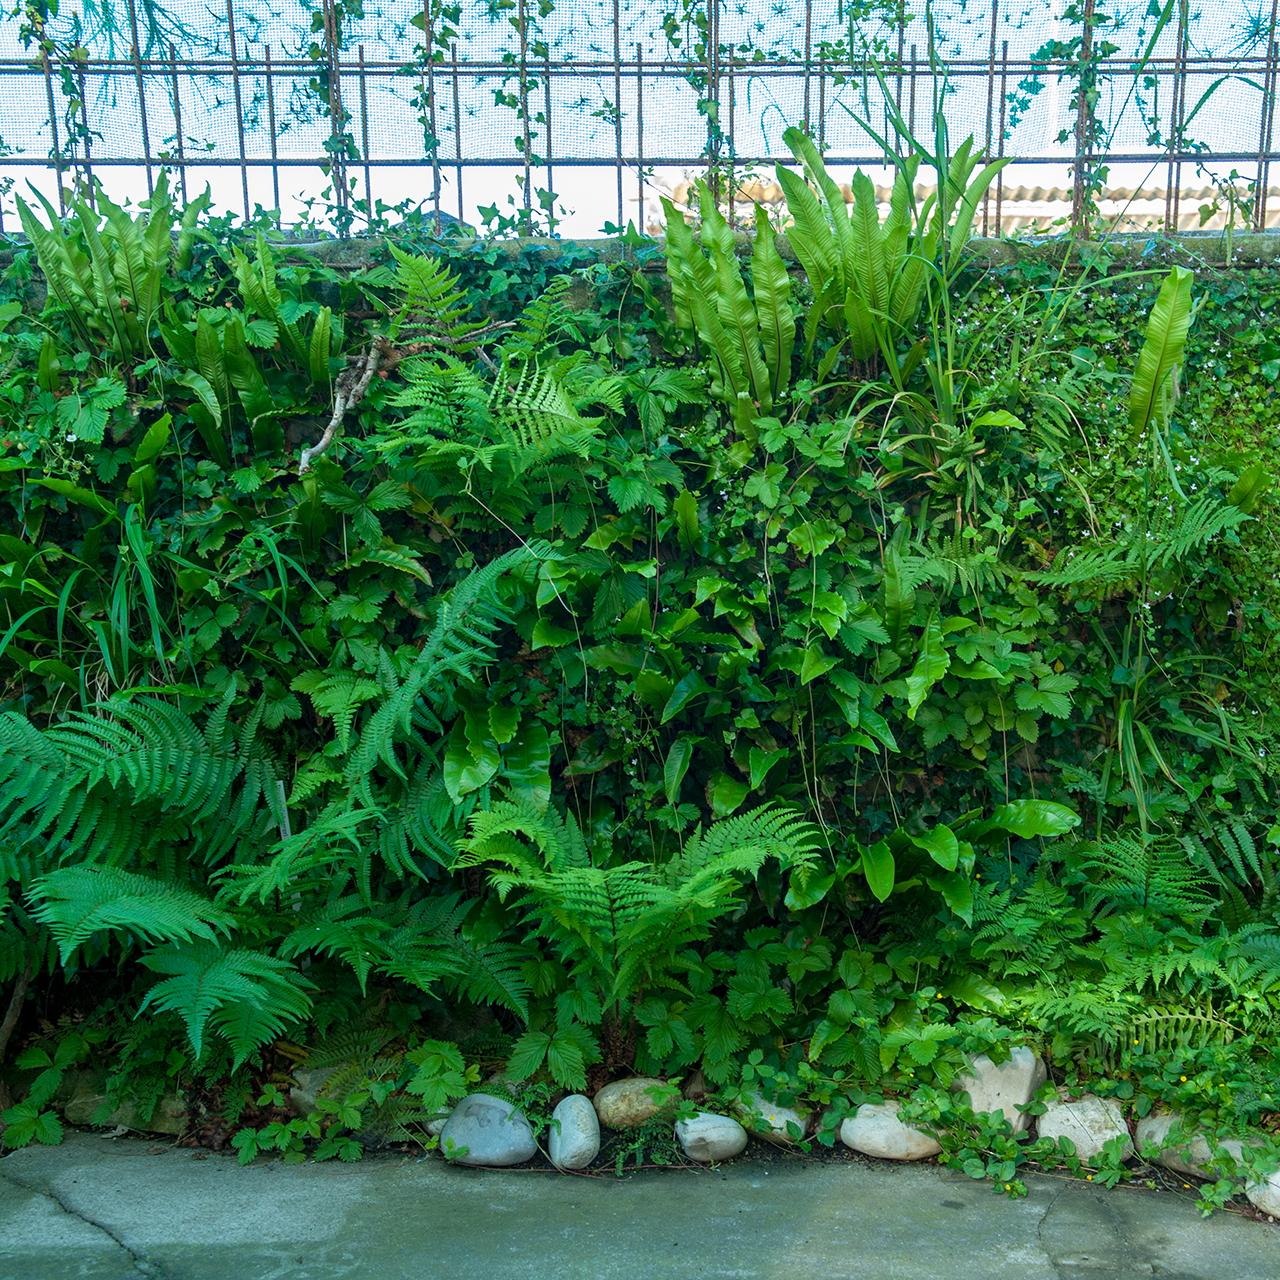 Vertical Garden at Farnwerk